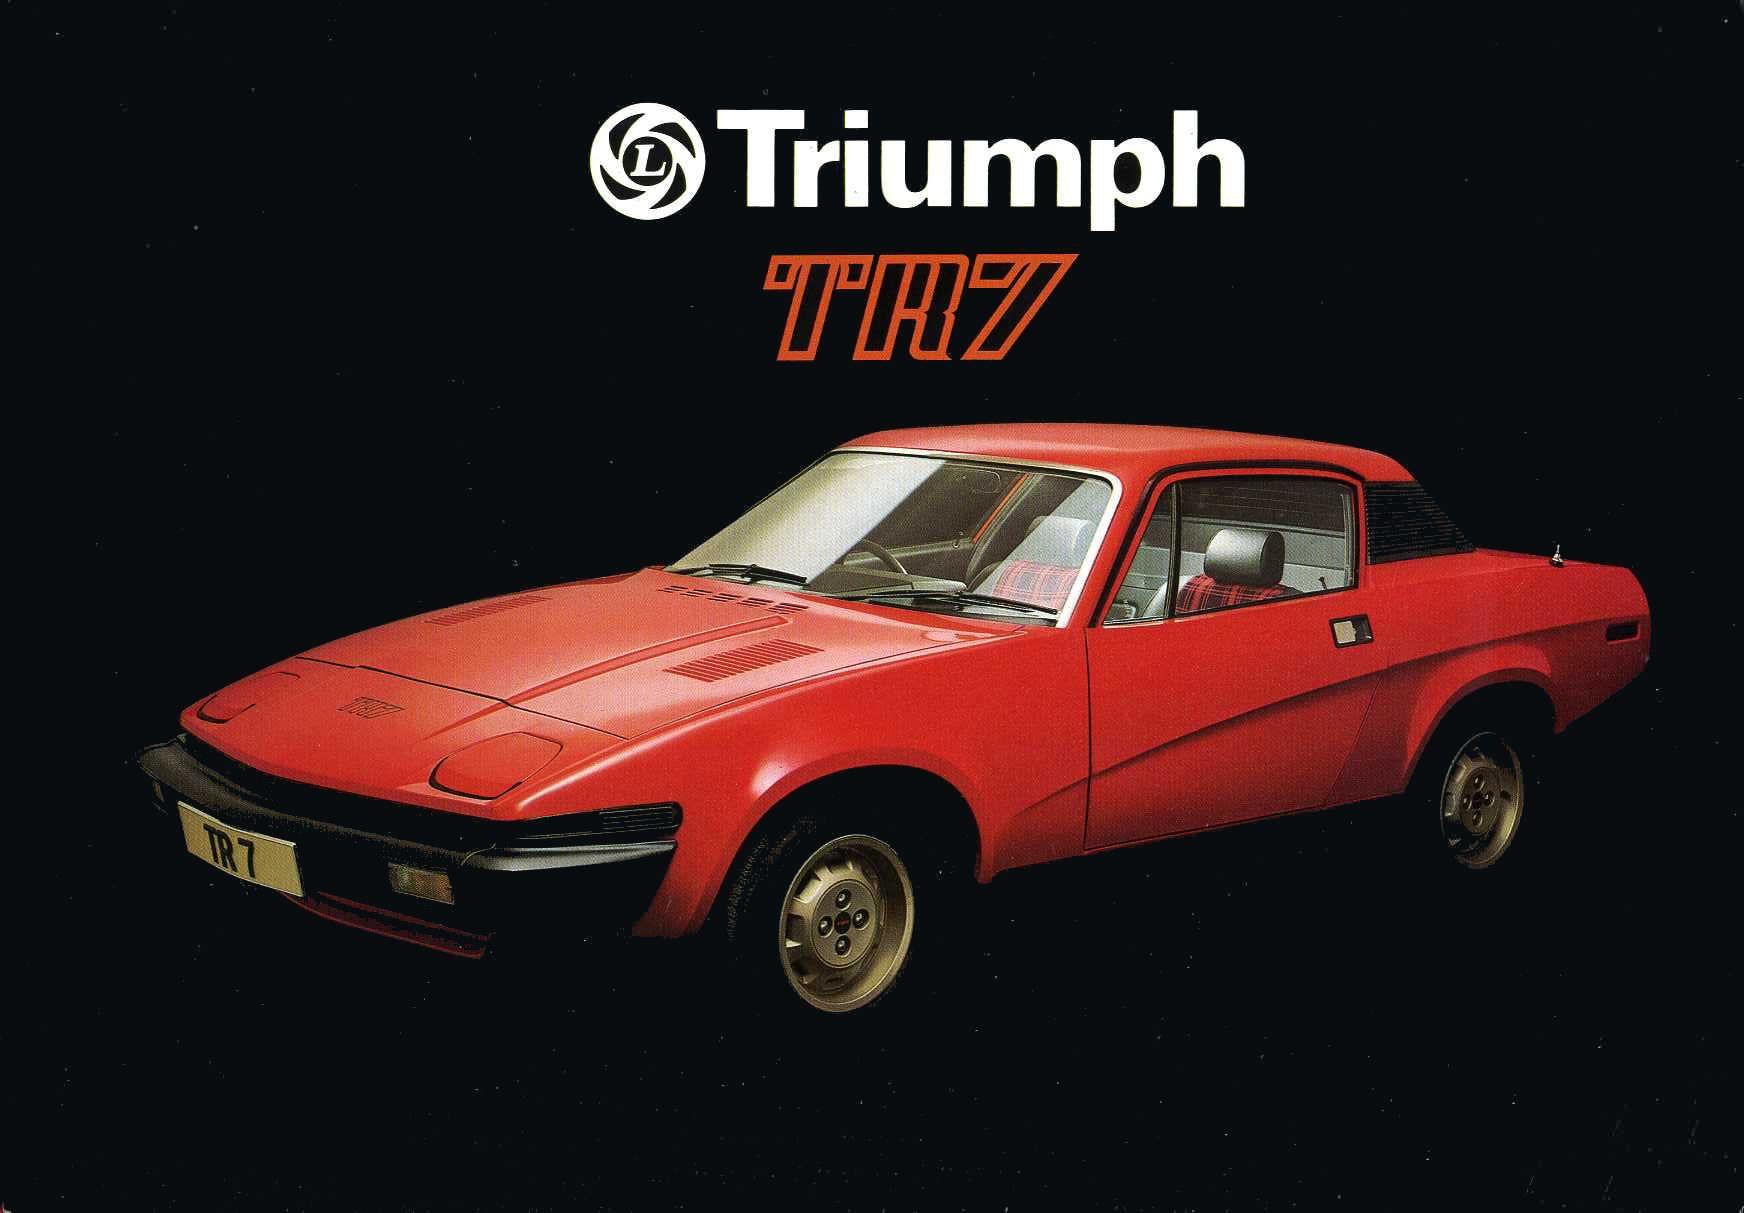 Triumph TR7 Cutaway Wallpaper | Cars and Vehicle